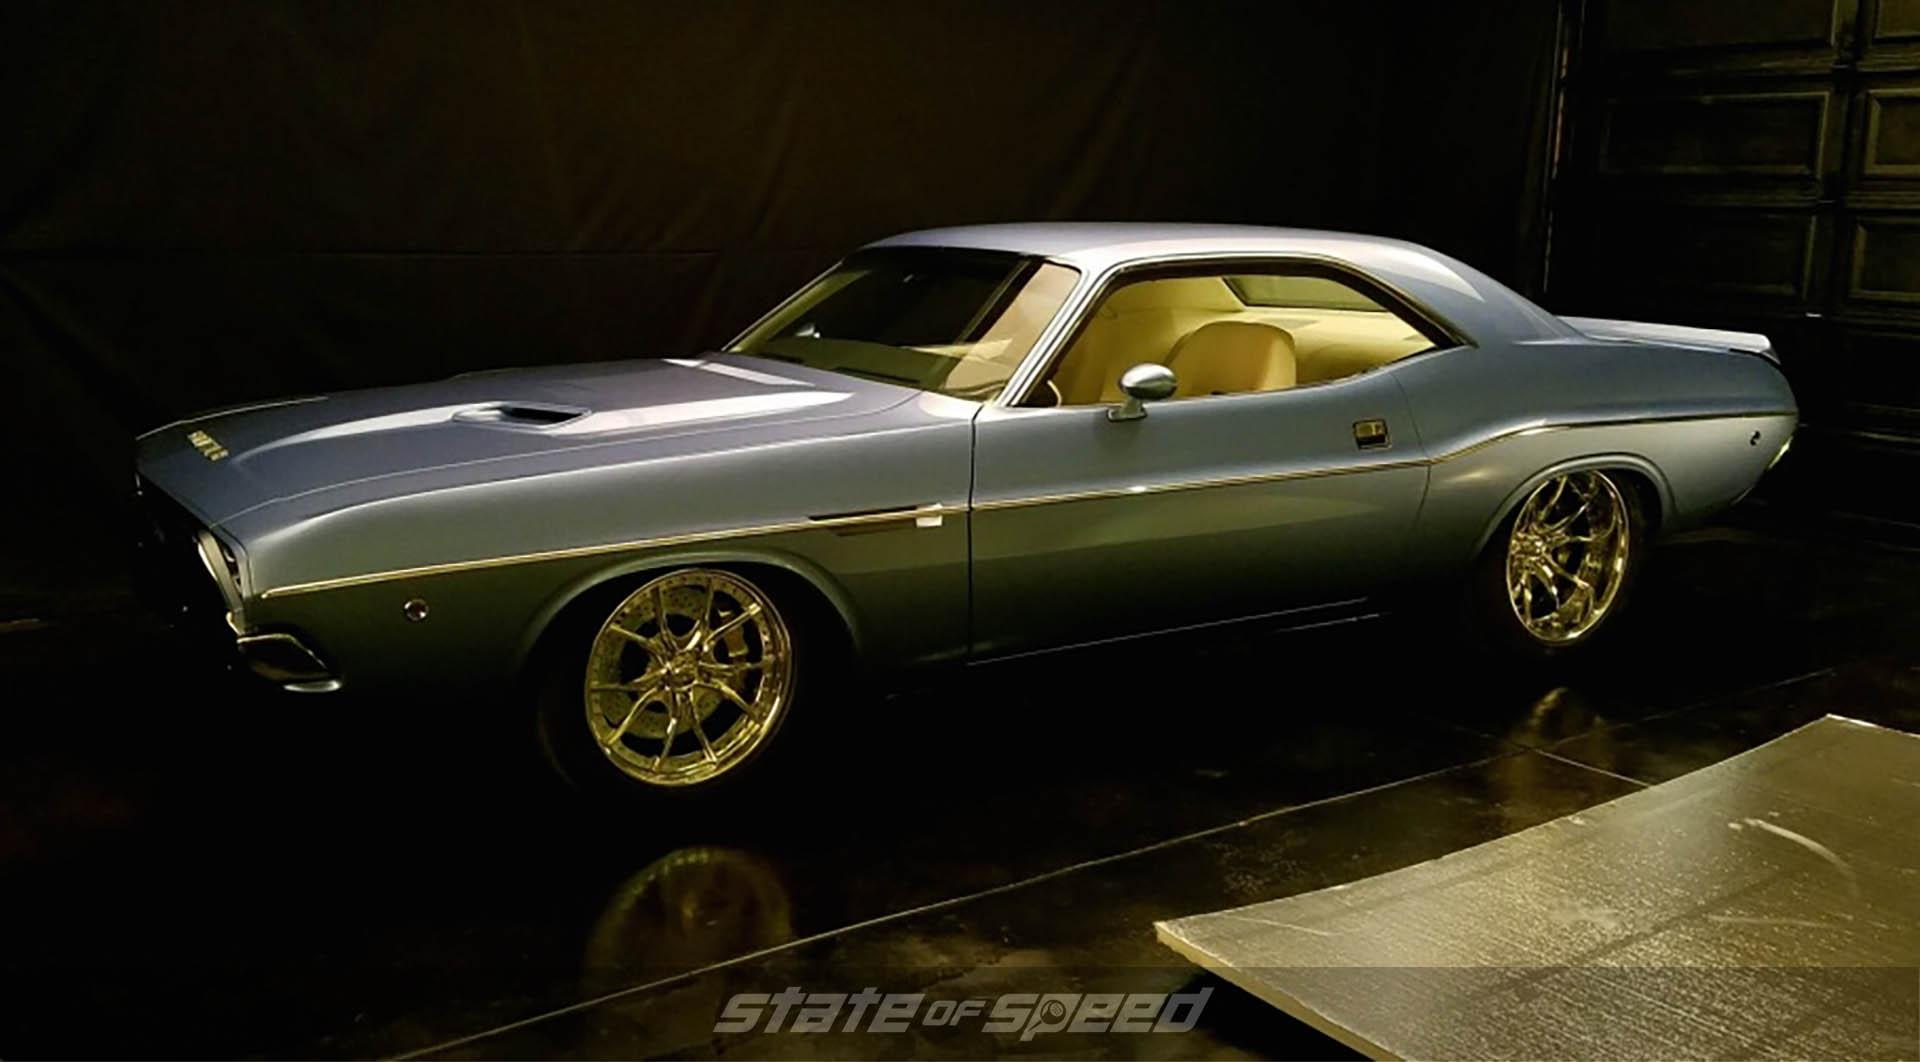 '73 Charles Schwab Challenger on display